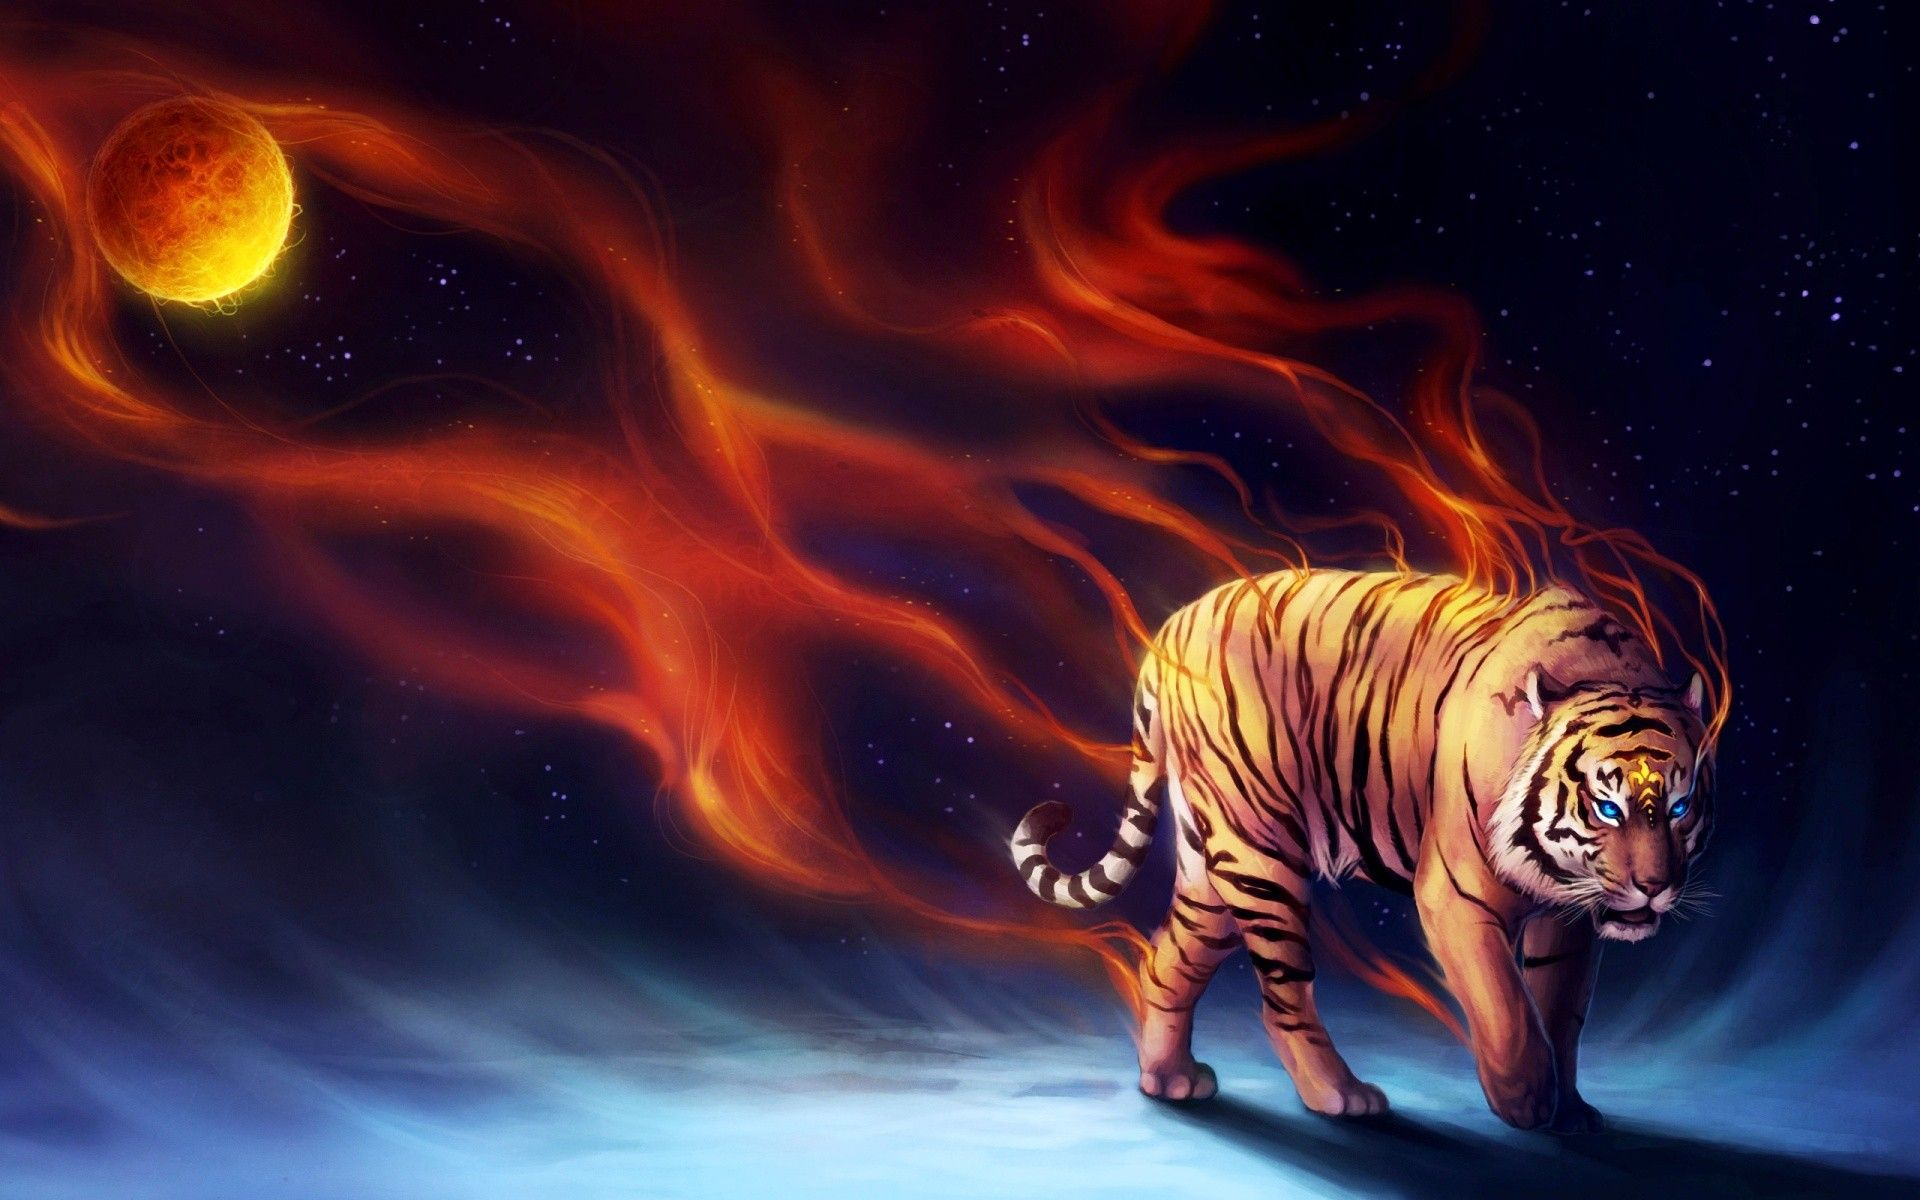 Digitalart Photo Manipulation Art Fire Tig Wildlife Endangered